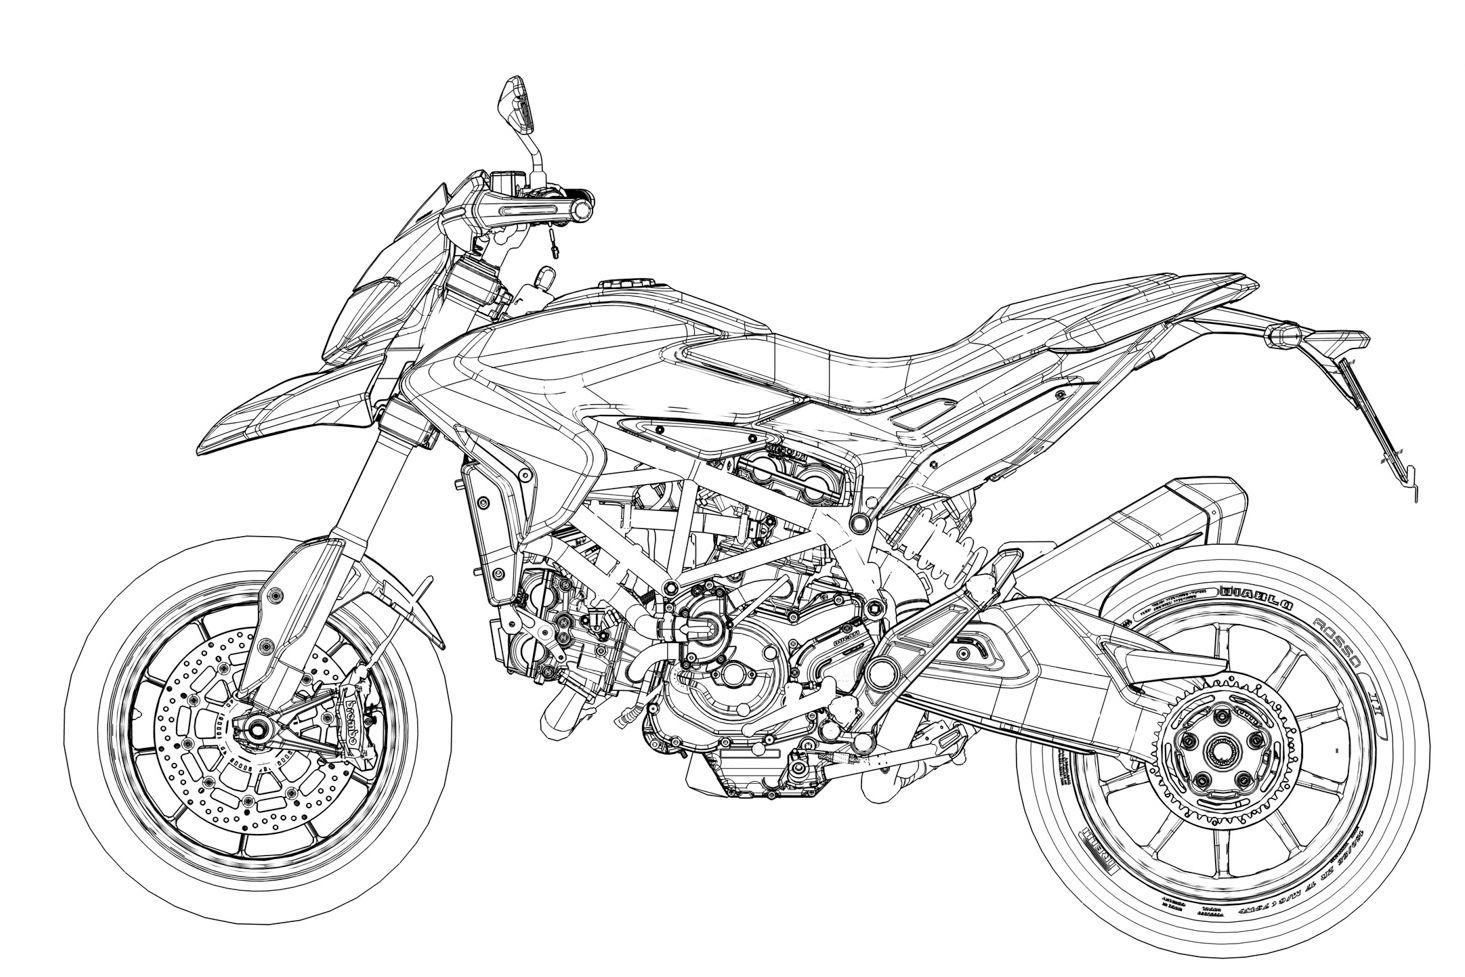 Ducati Hypermotard Cad Drawing